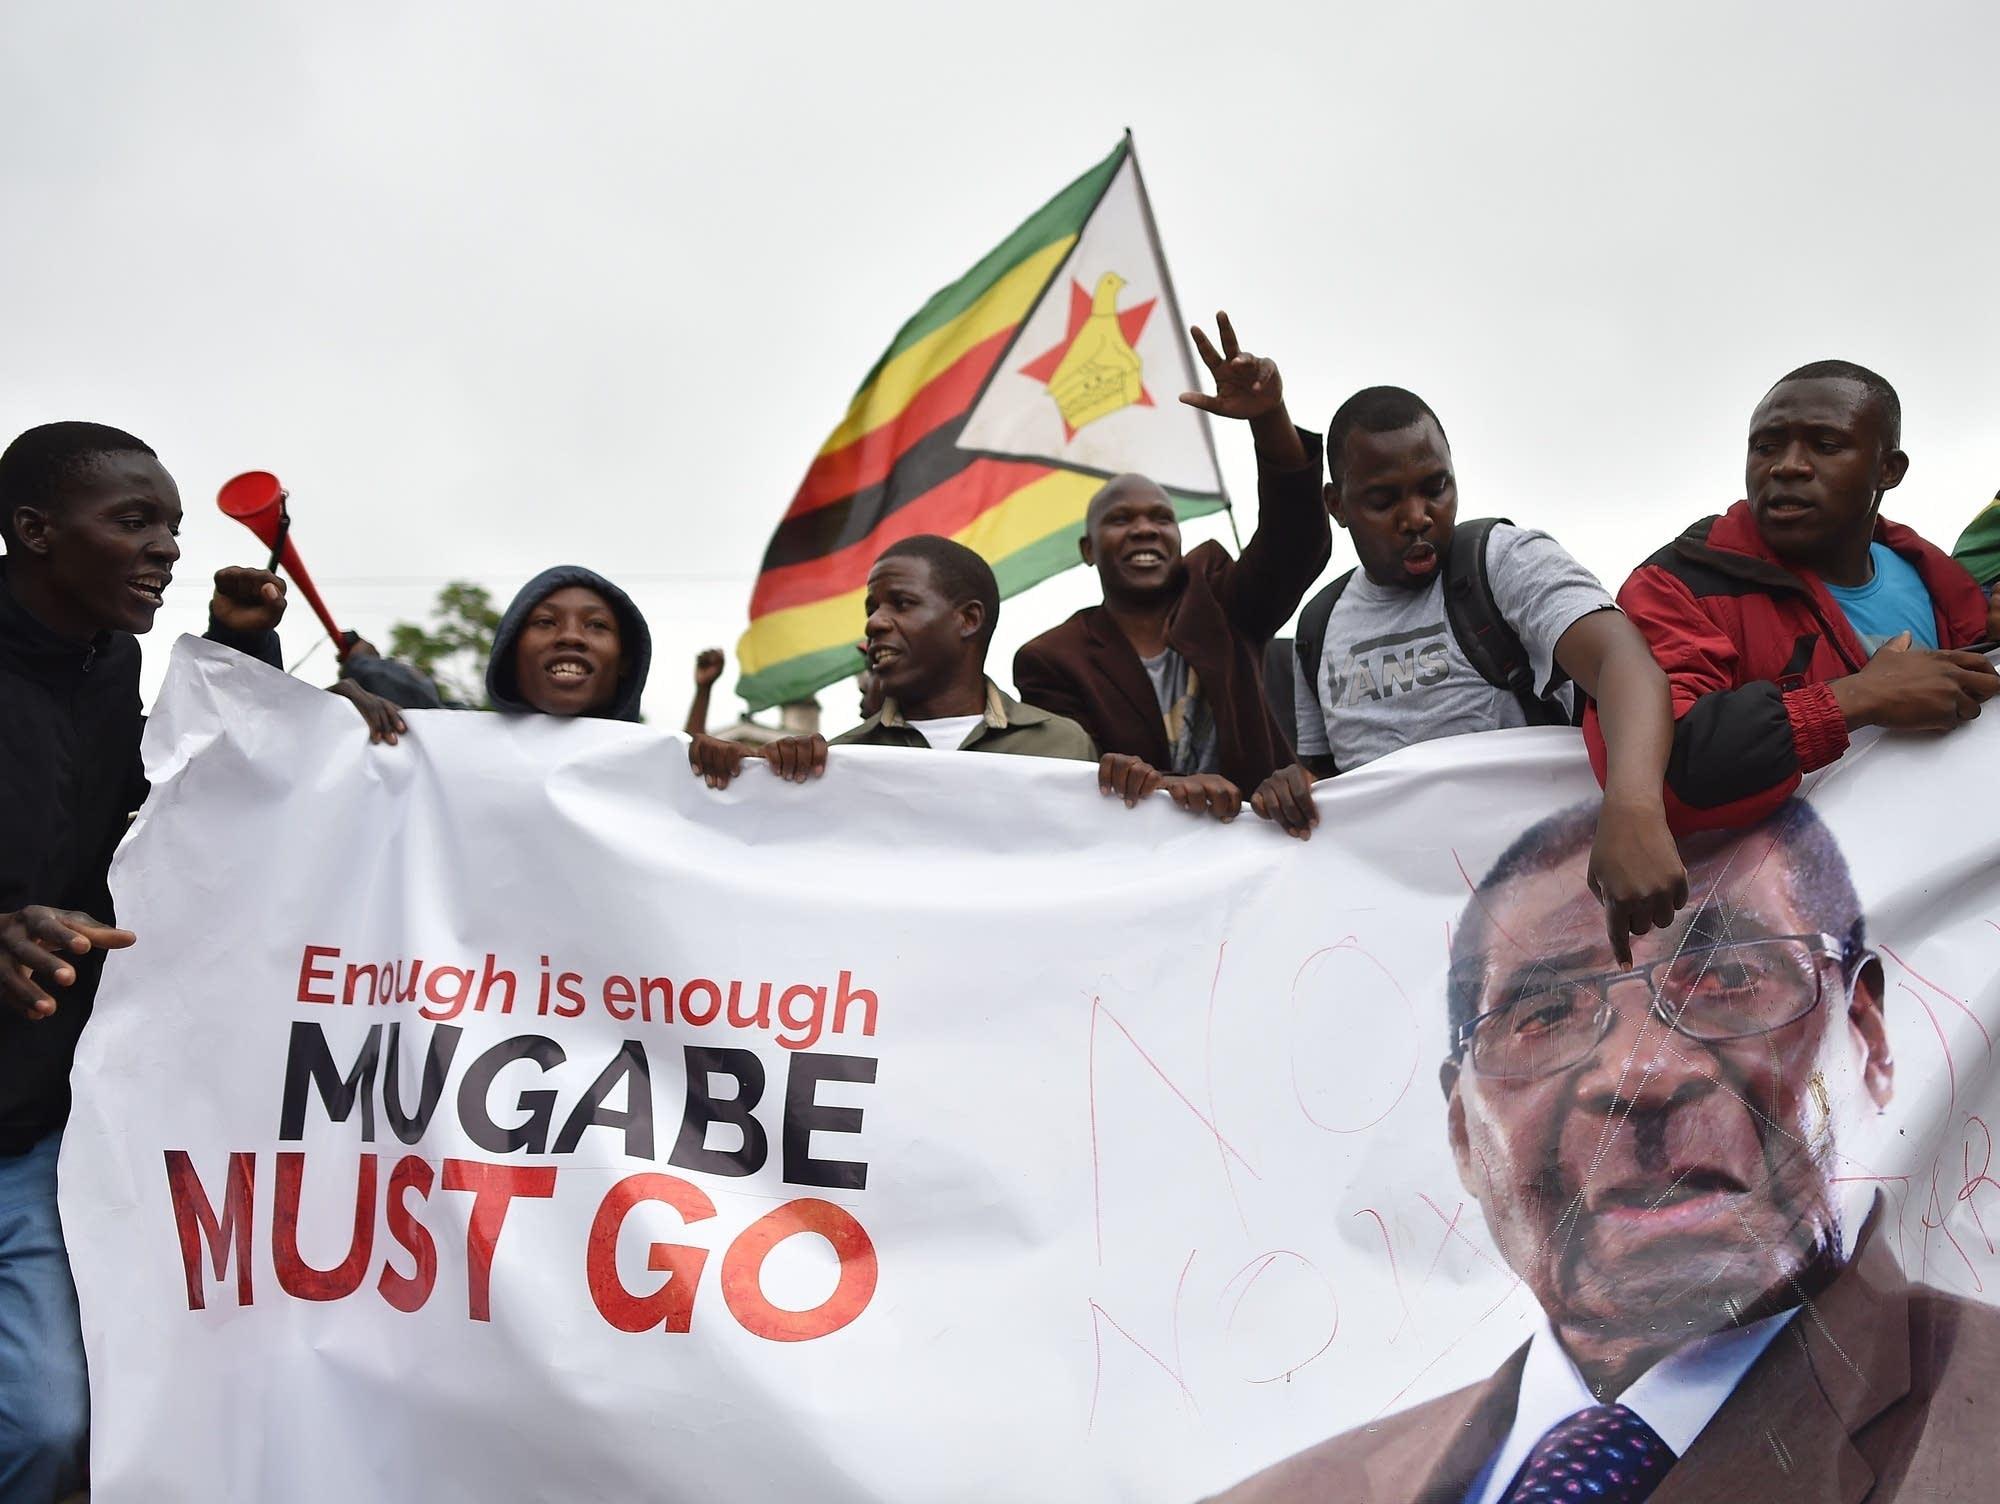 A demonstration demanding the resignation of Zimbabwe's president.